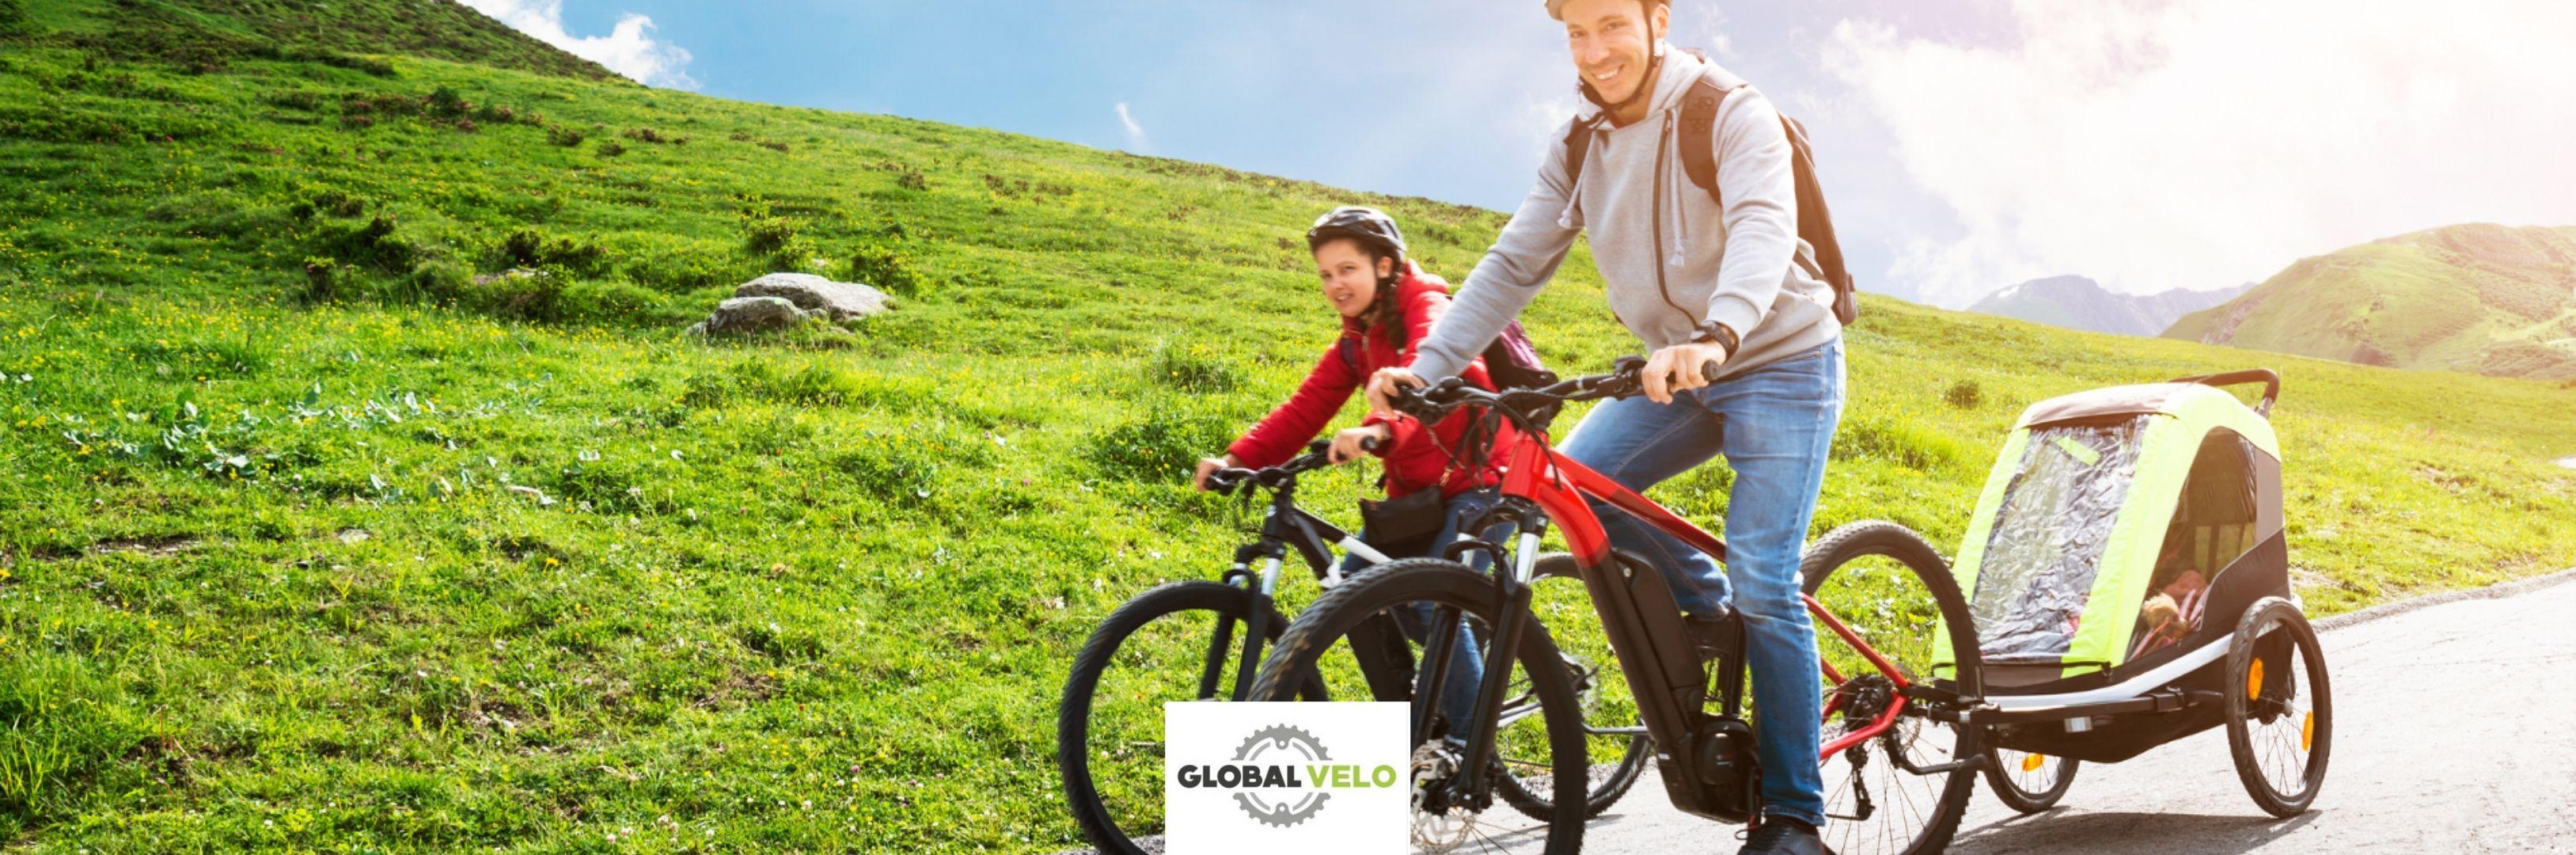 Balade en vélo et remorque